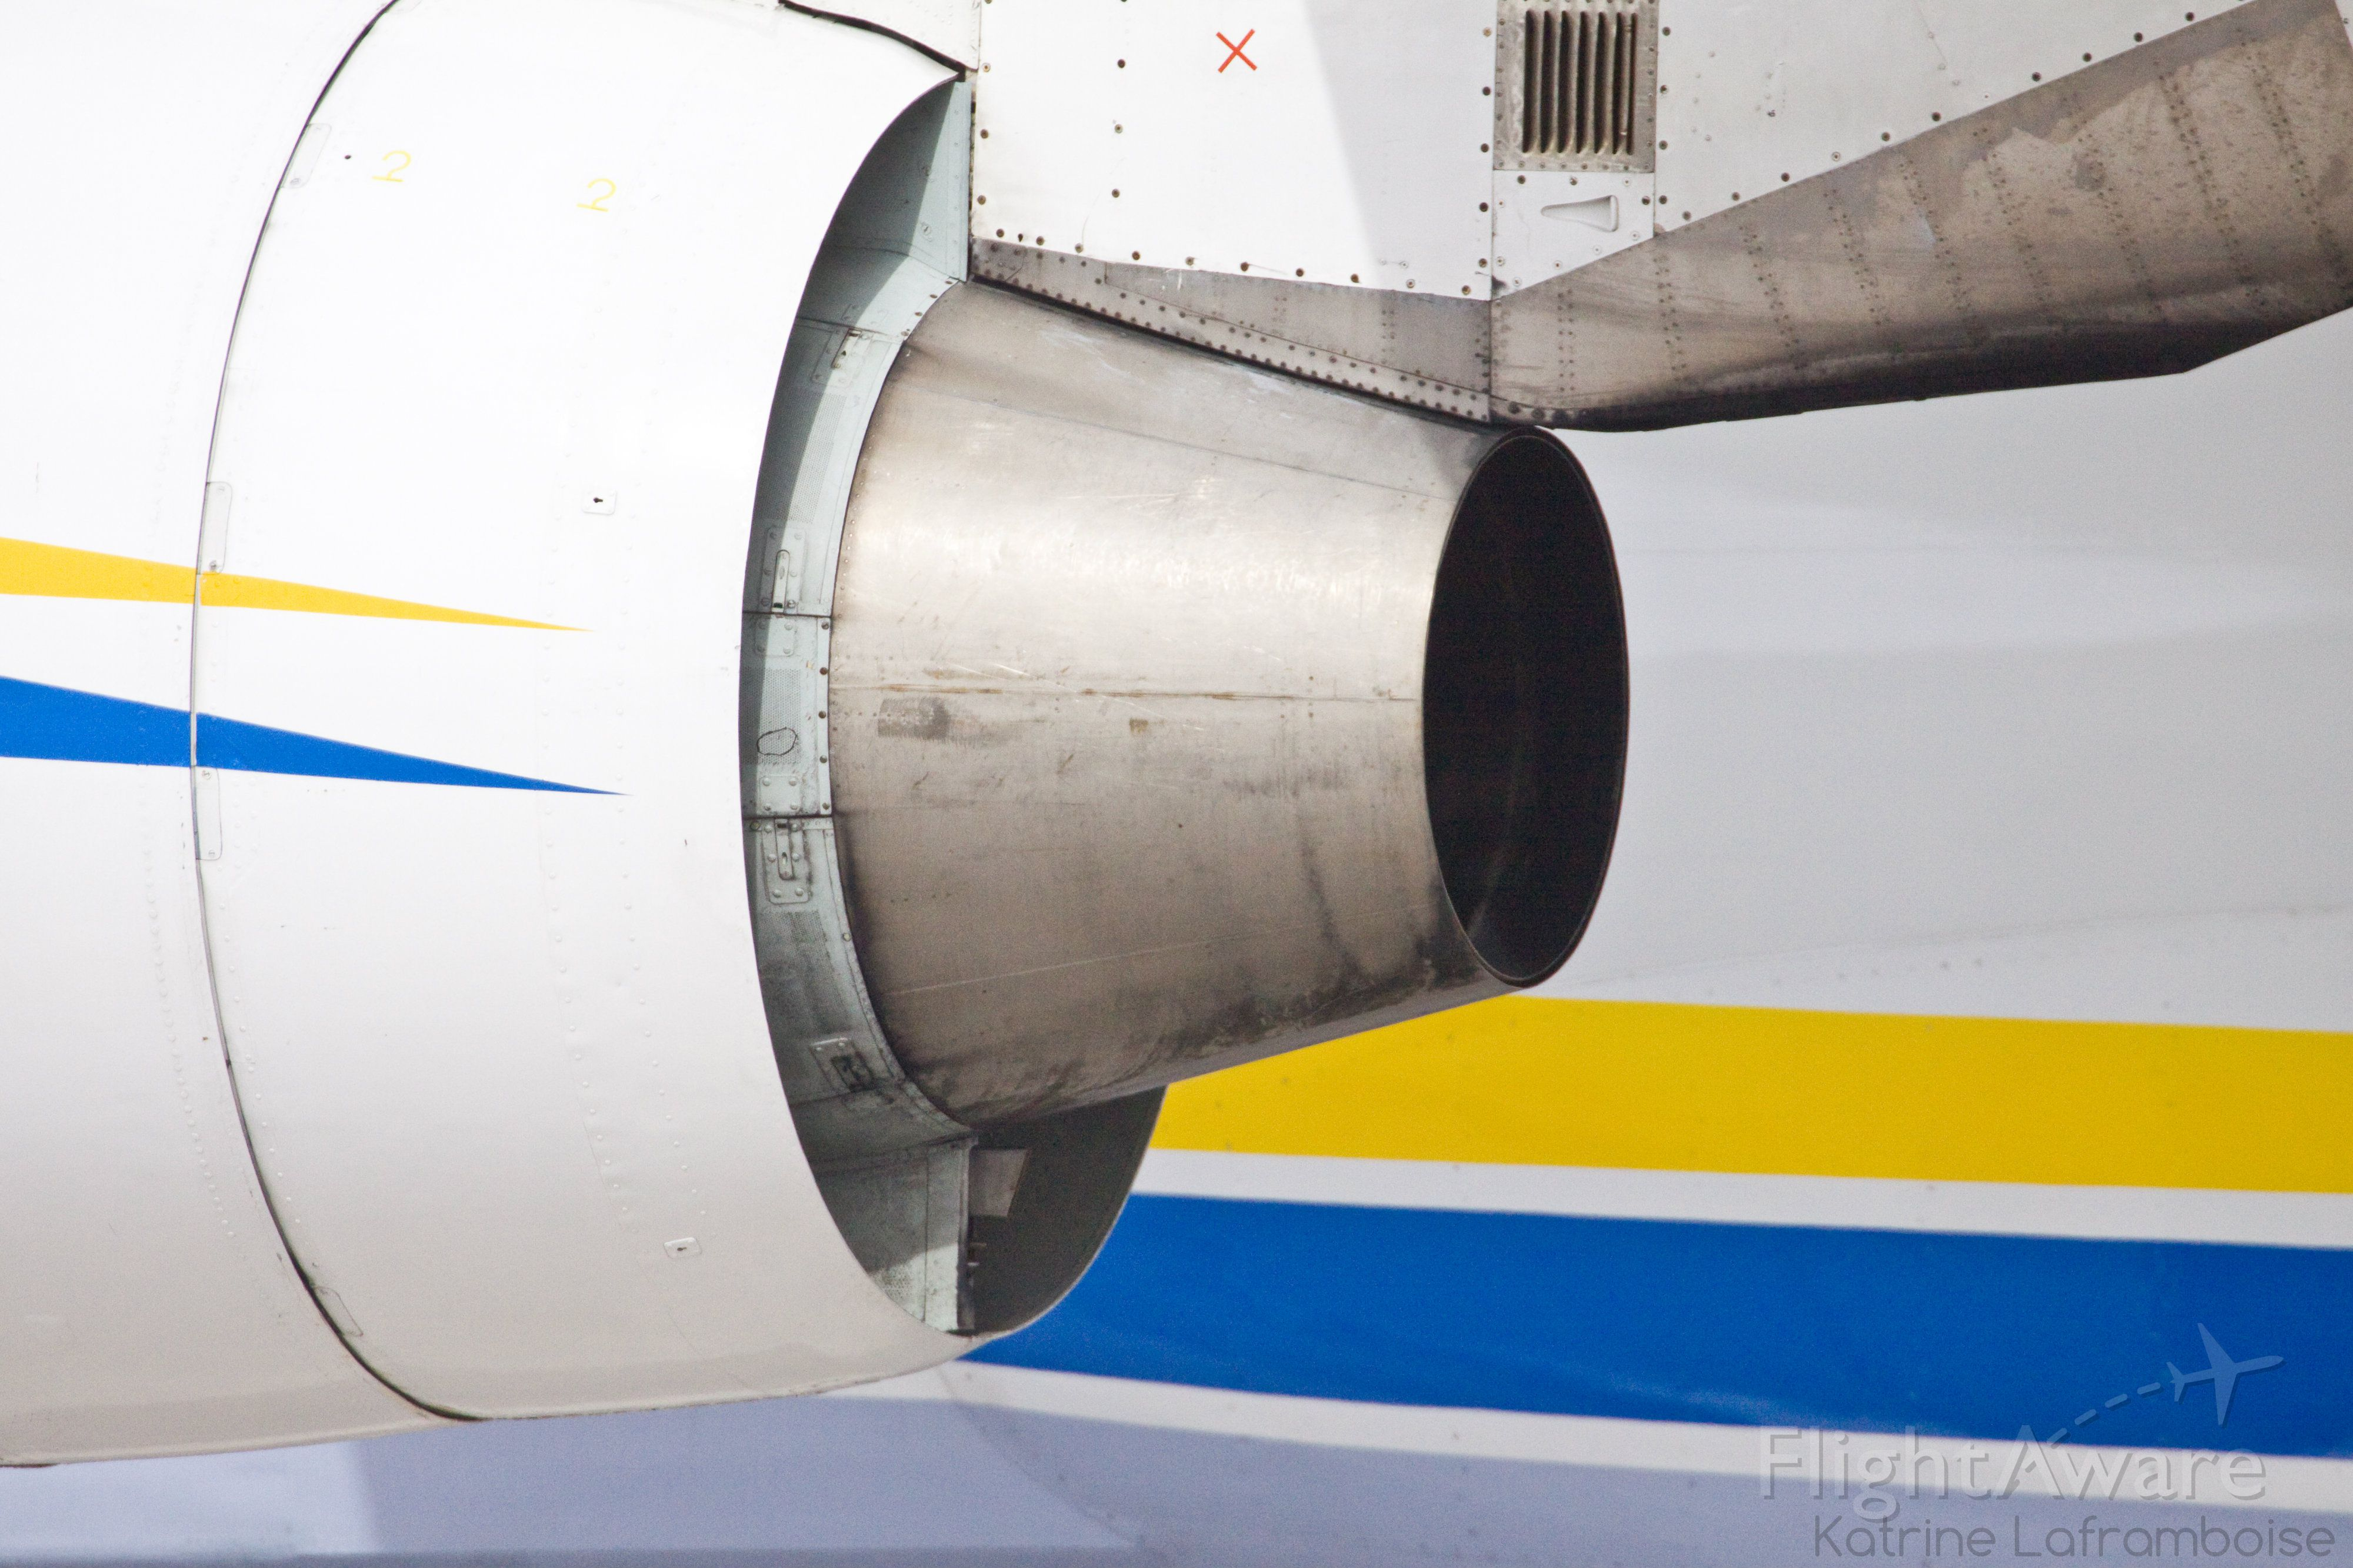 Antonov An-124 Ruslan (UR-82008) - The Beast